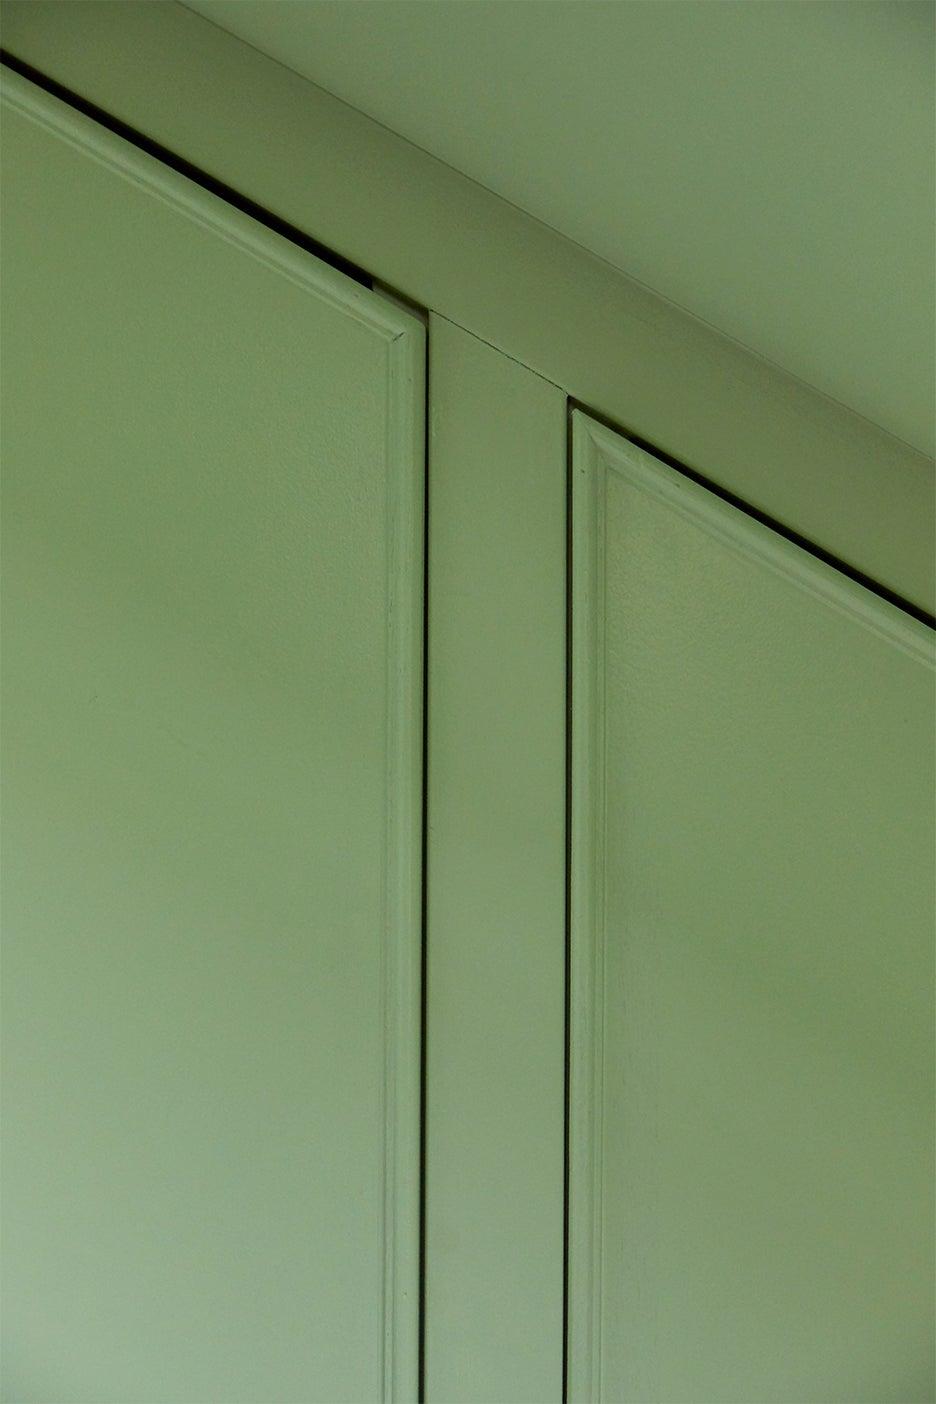 Pistachio paint closet doors